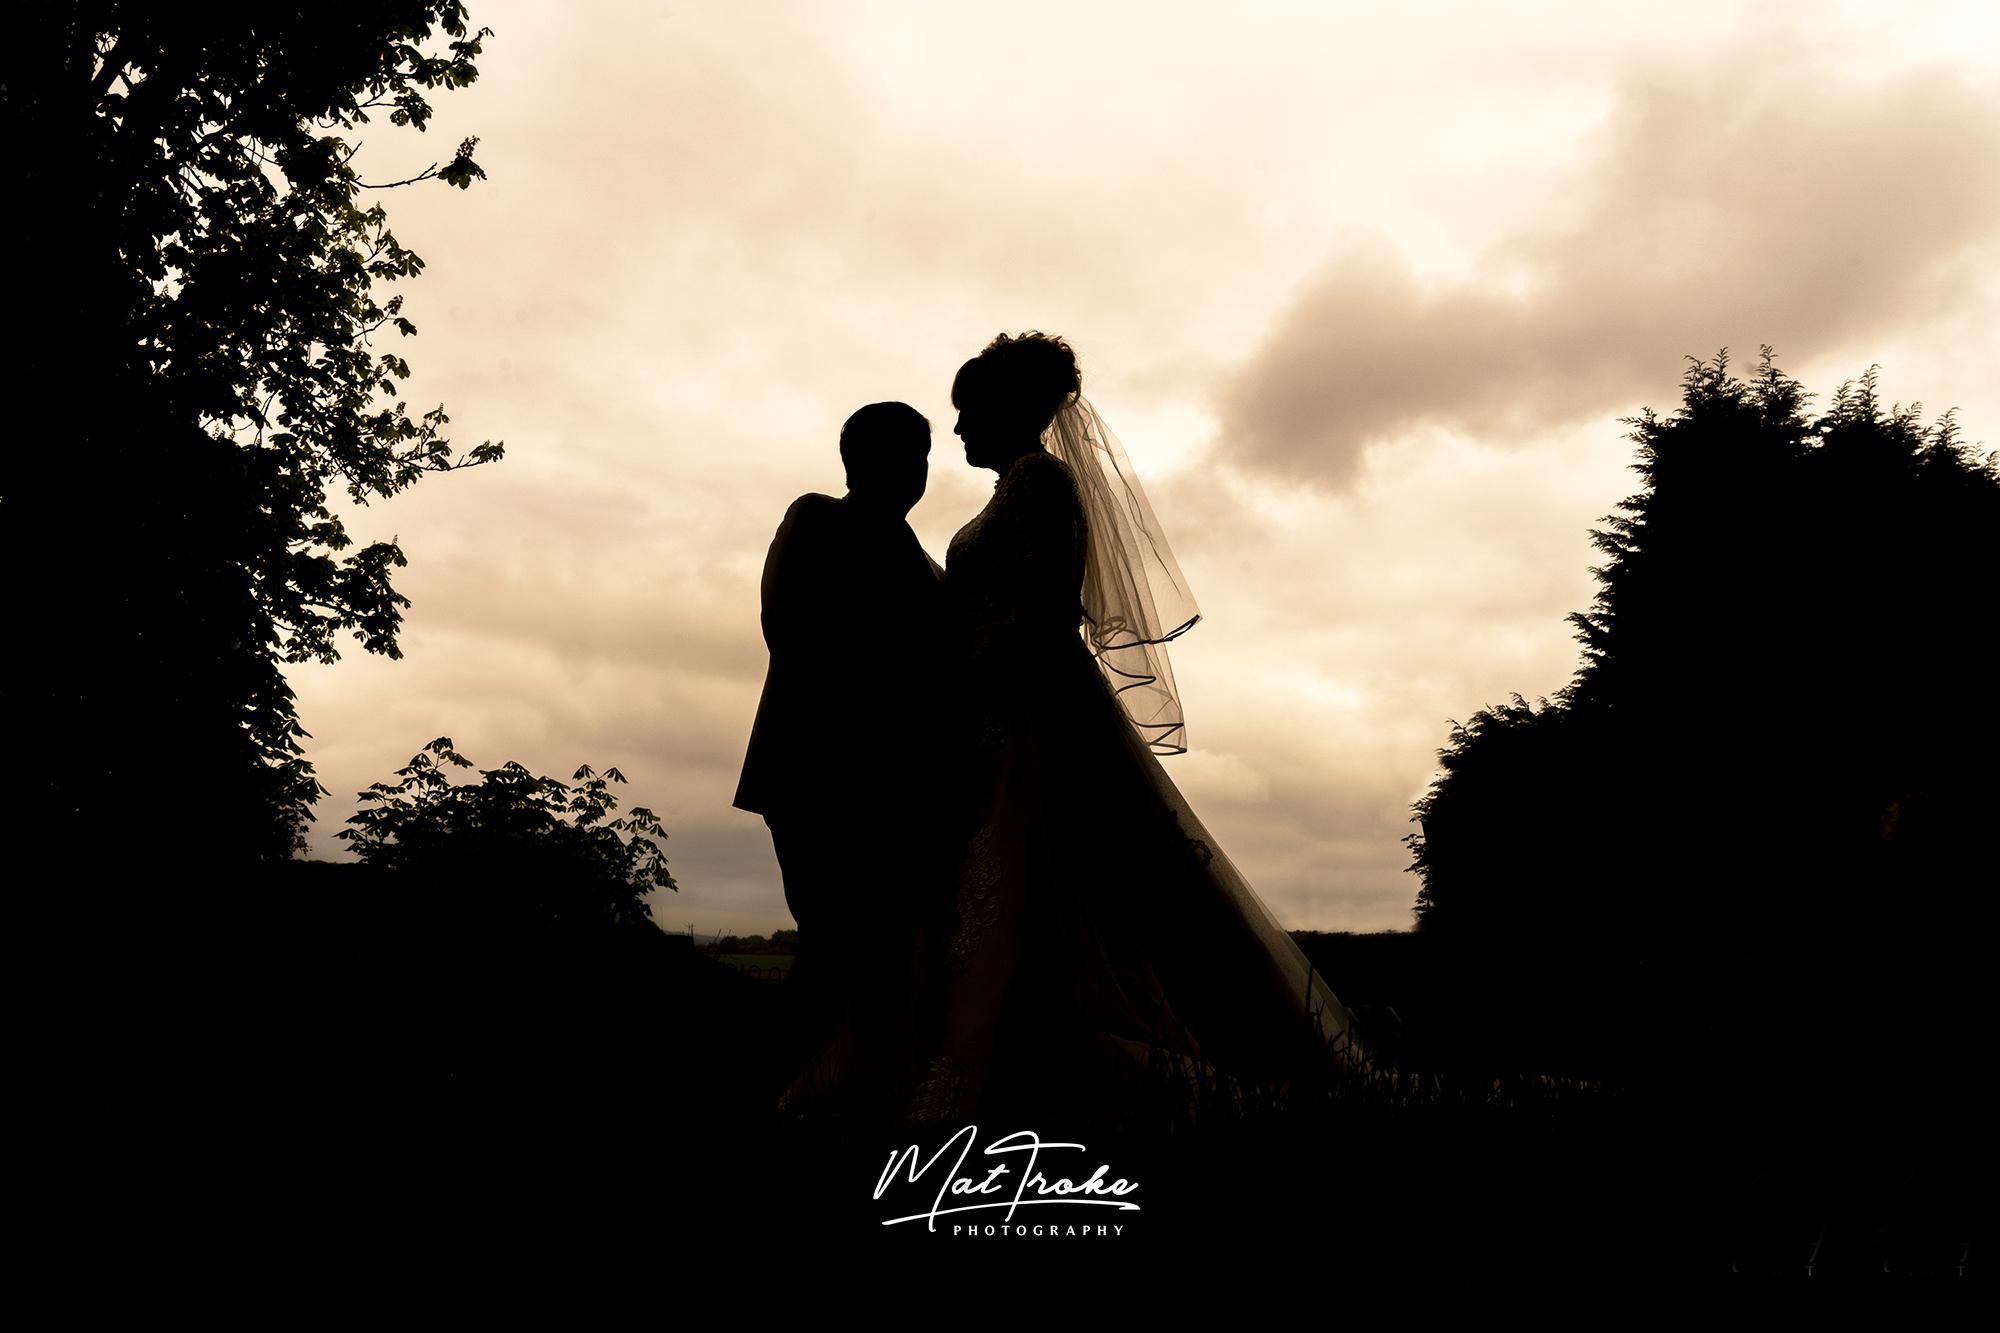 Mour Hotel Annesley - Wedding